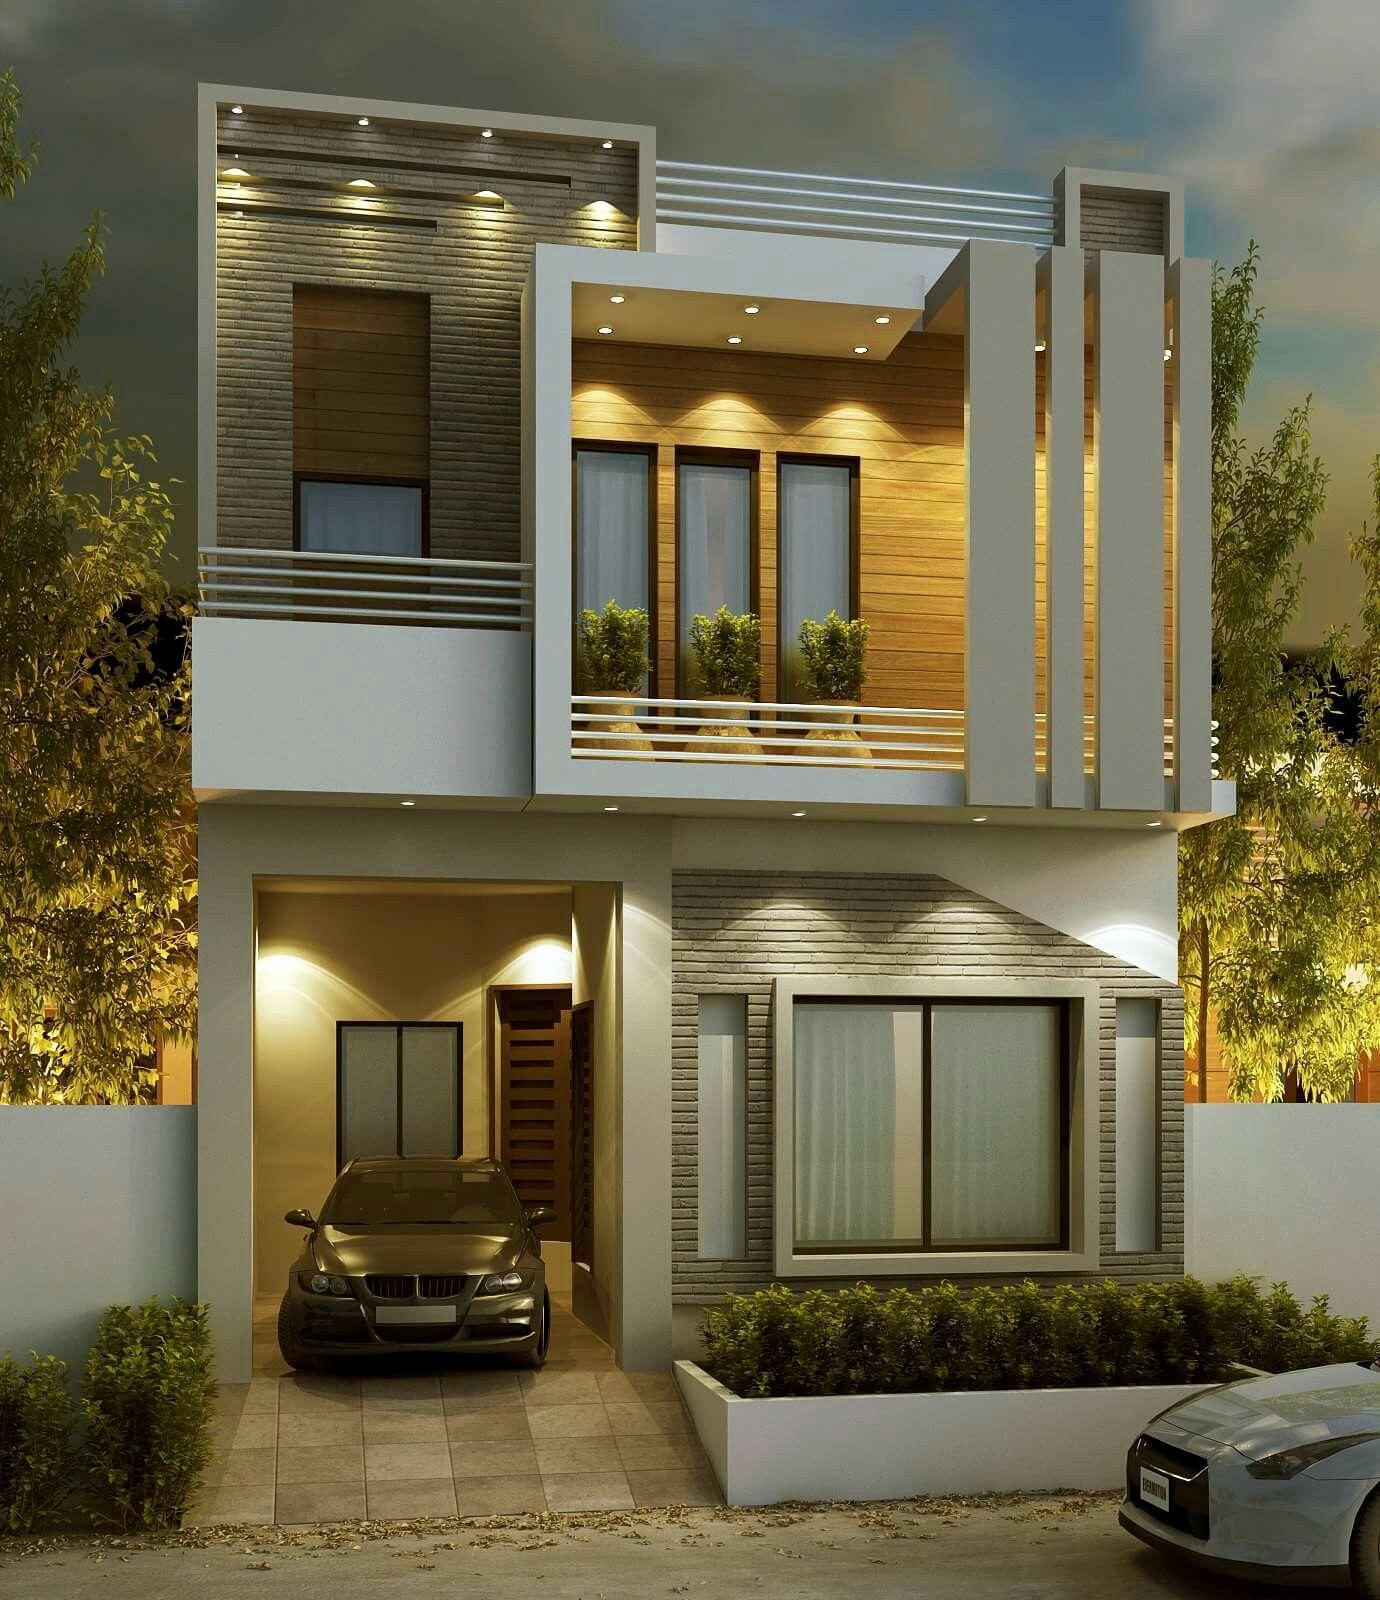 Modern Front Elevation 5 Marla House Design - valoblogi com